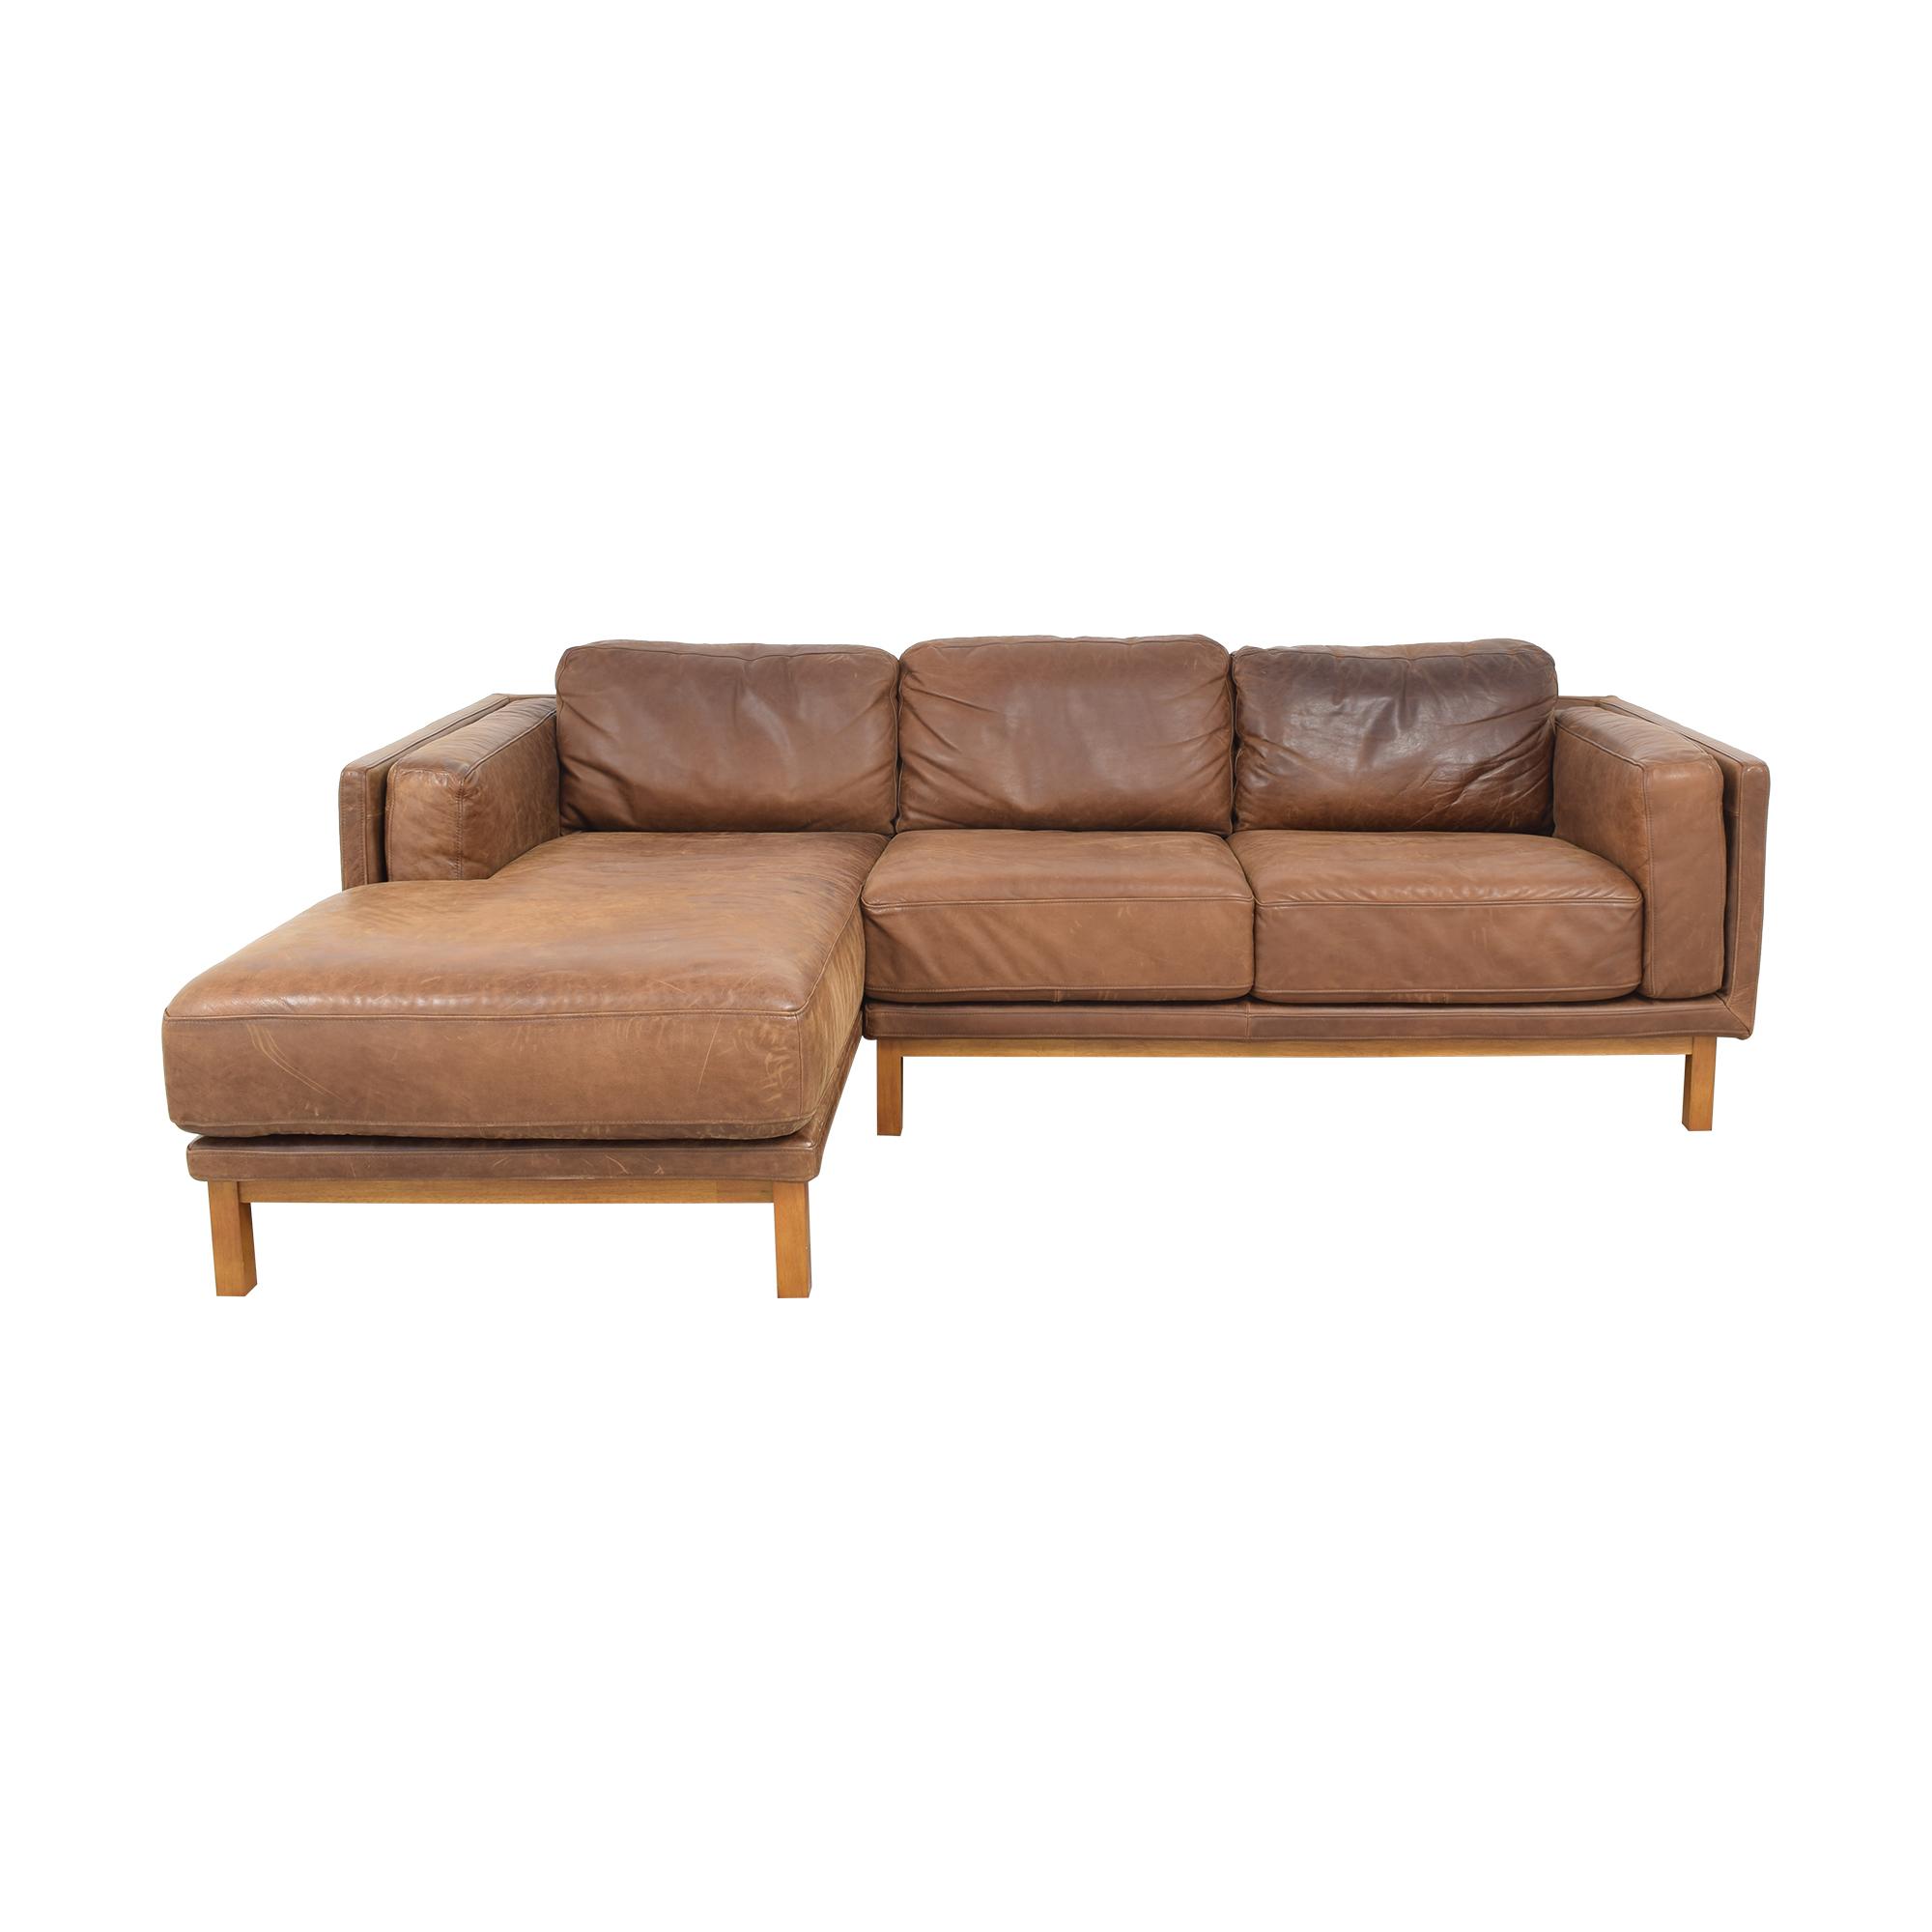 West Elm West Elm Dekalb Leather 2-Piece Chaise Sectional Sectionals